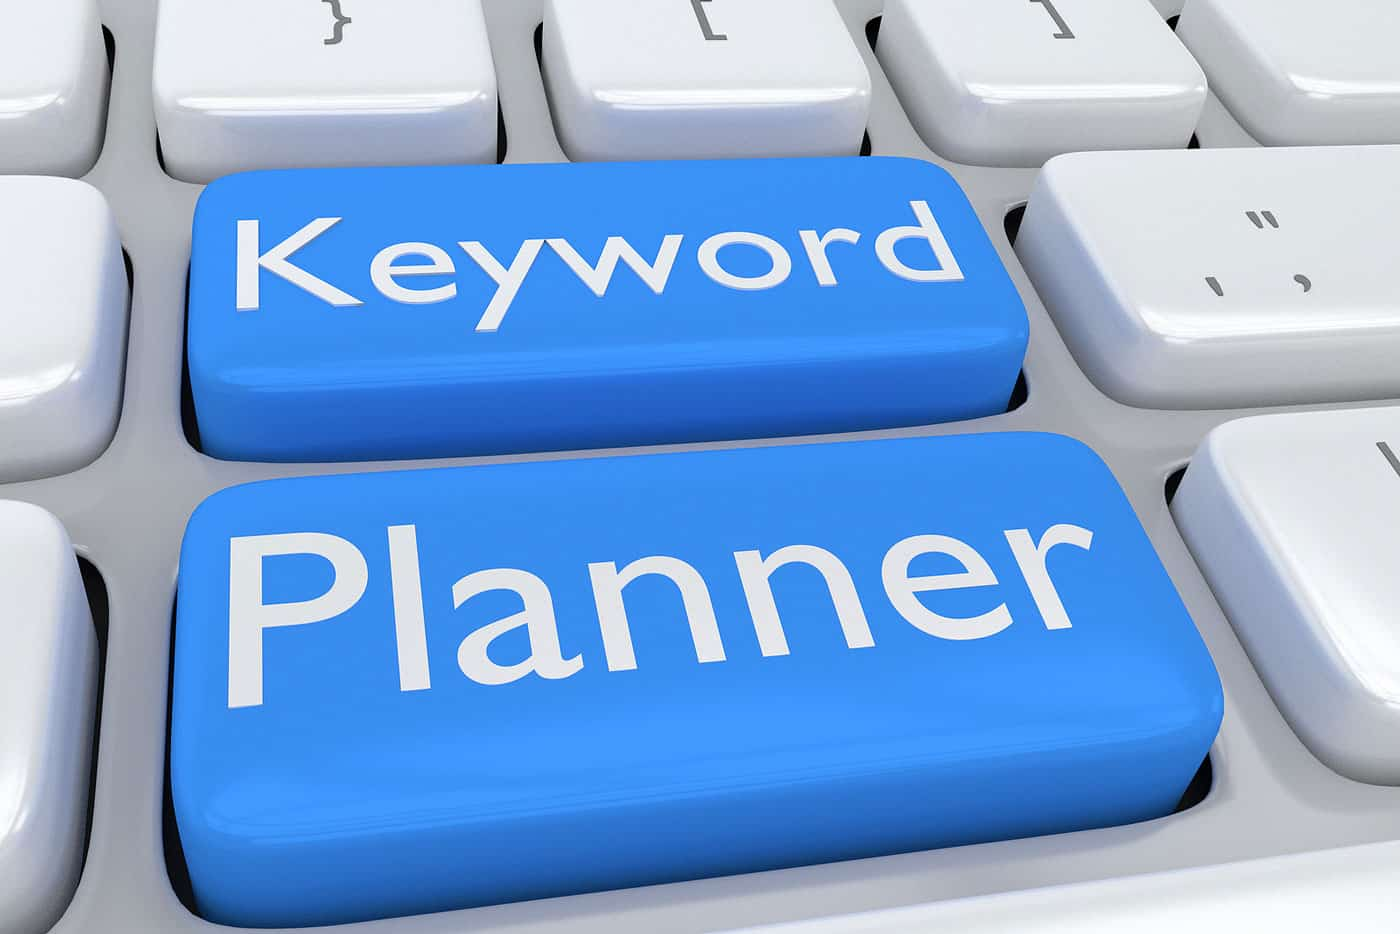 Keyboard with Keyword Planner keys